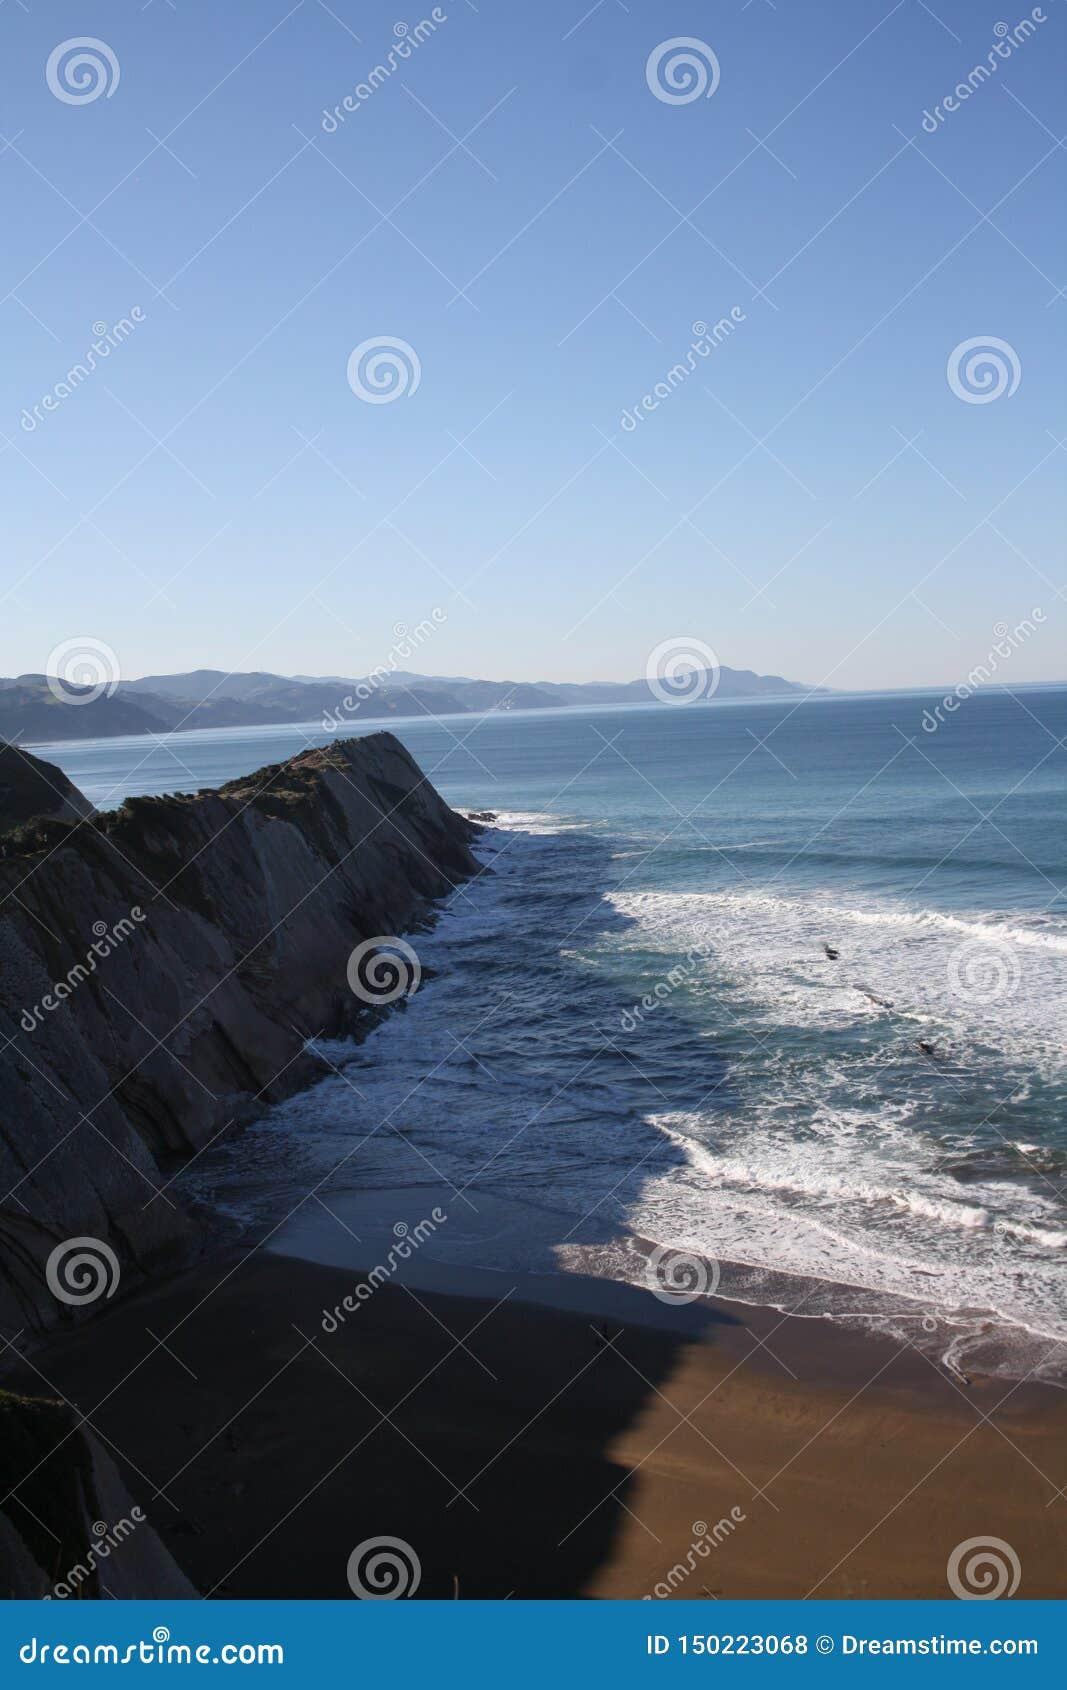 San Sebastian Sea